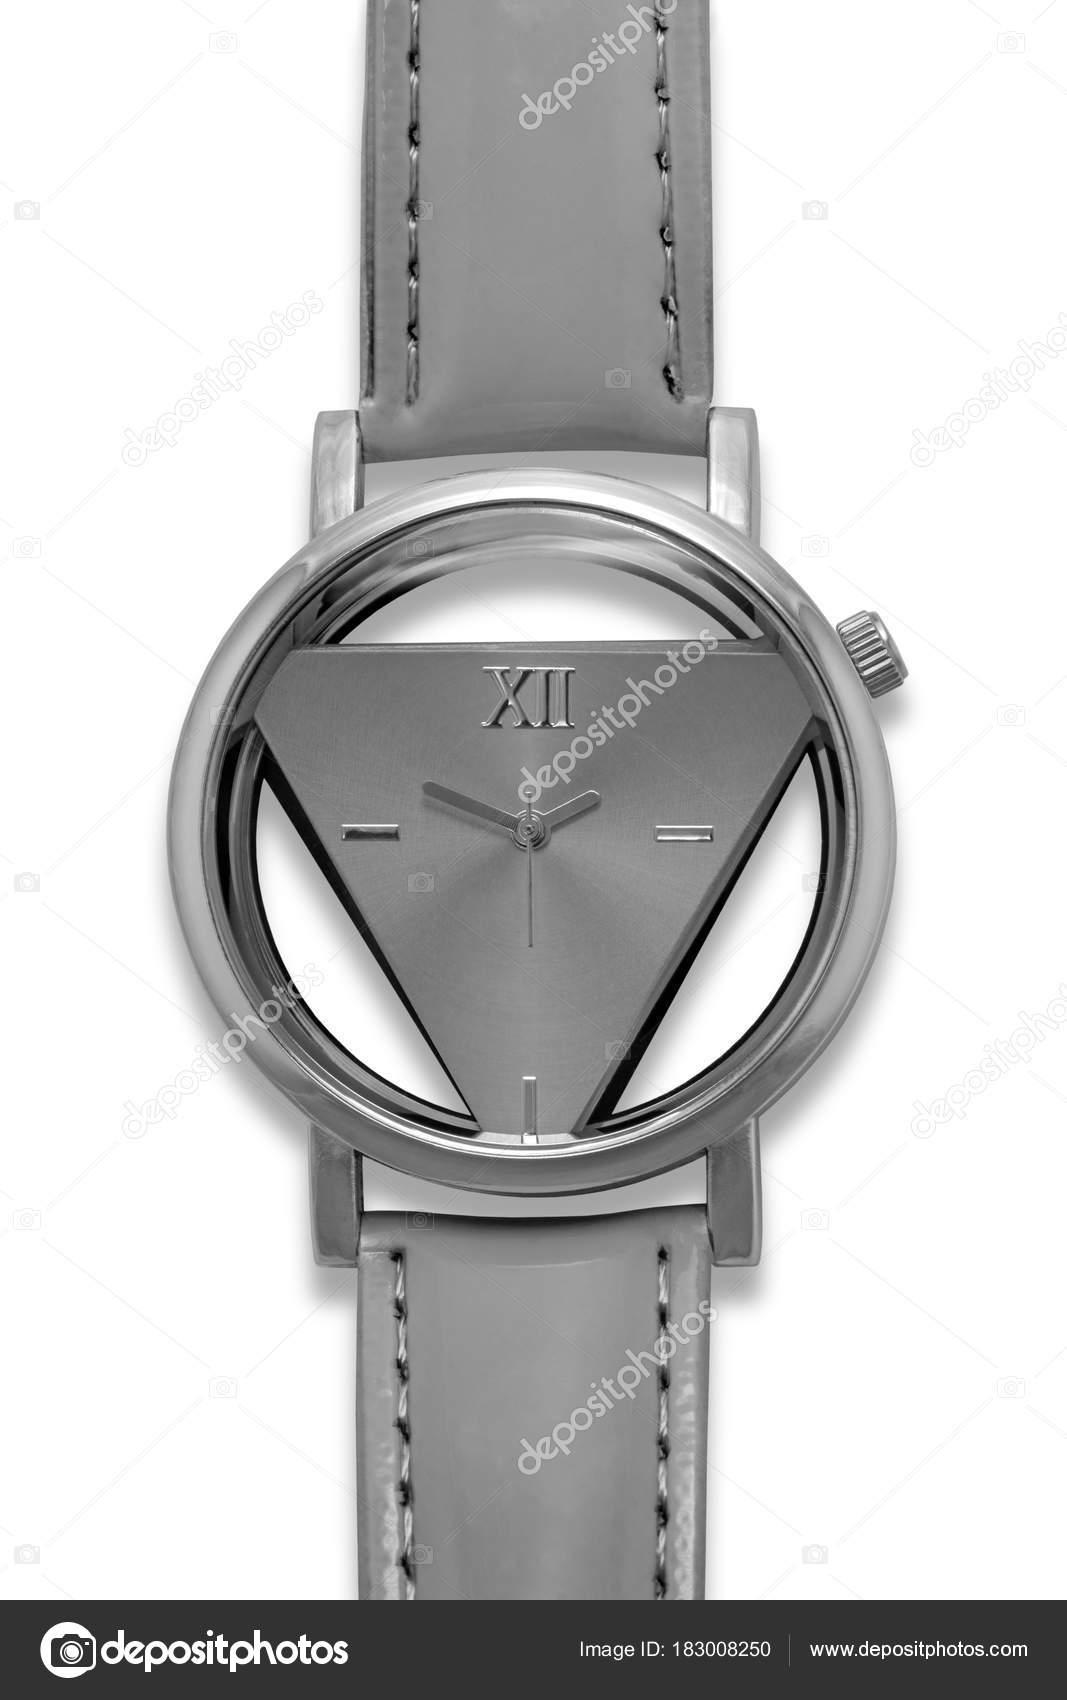 7de8e90ff1 Stylový originální pochromované kovové Dámské Náramkové hodinky s šedou  trojúhelníkové vytáčení a kožené prošívané náramkové izolovaných na bílém  pozadí